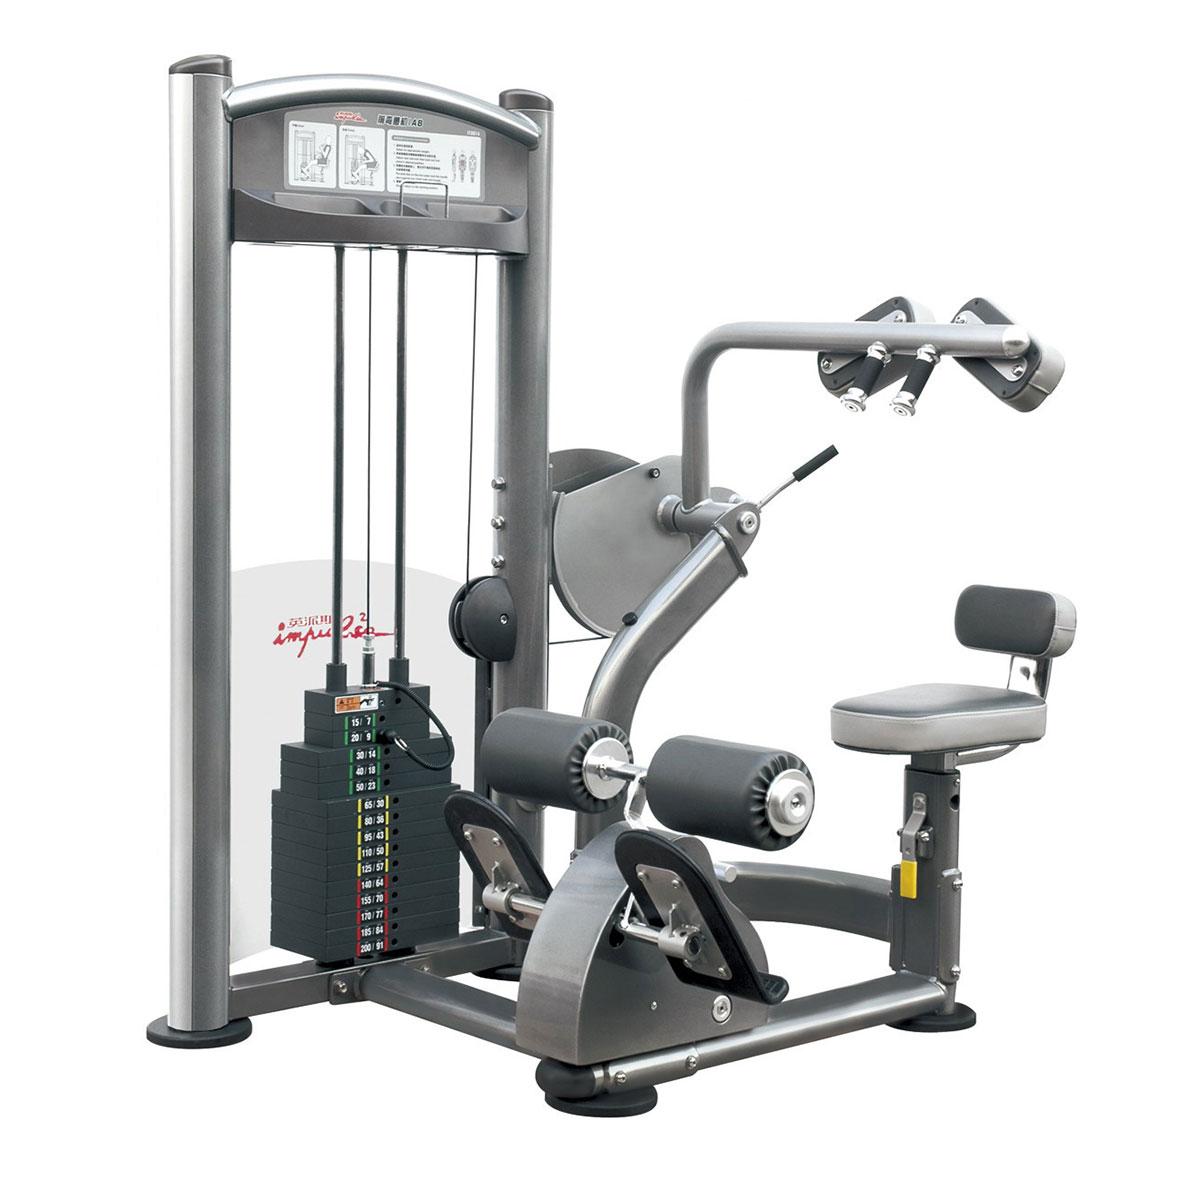 Abdominal - 200 lbs Impulse